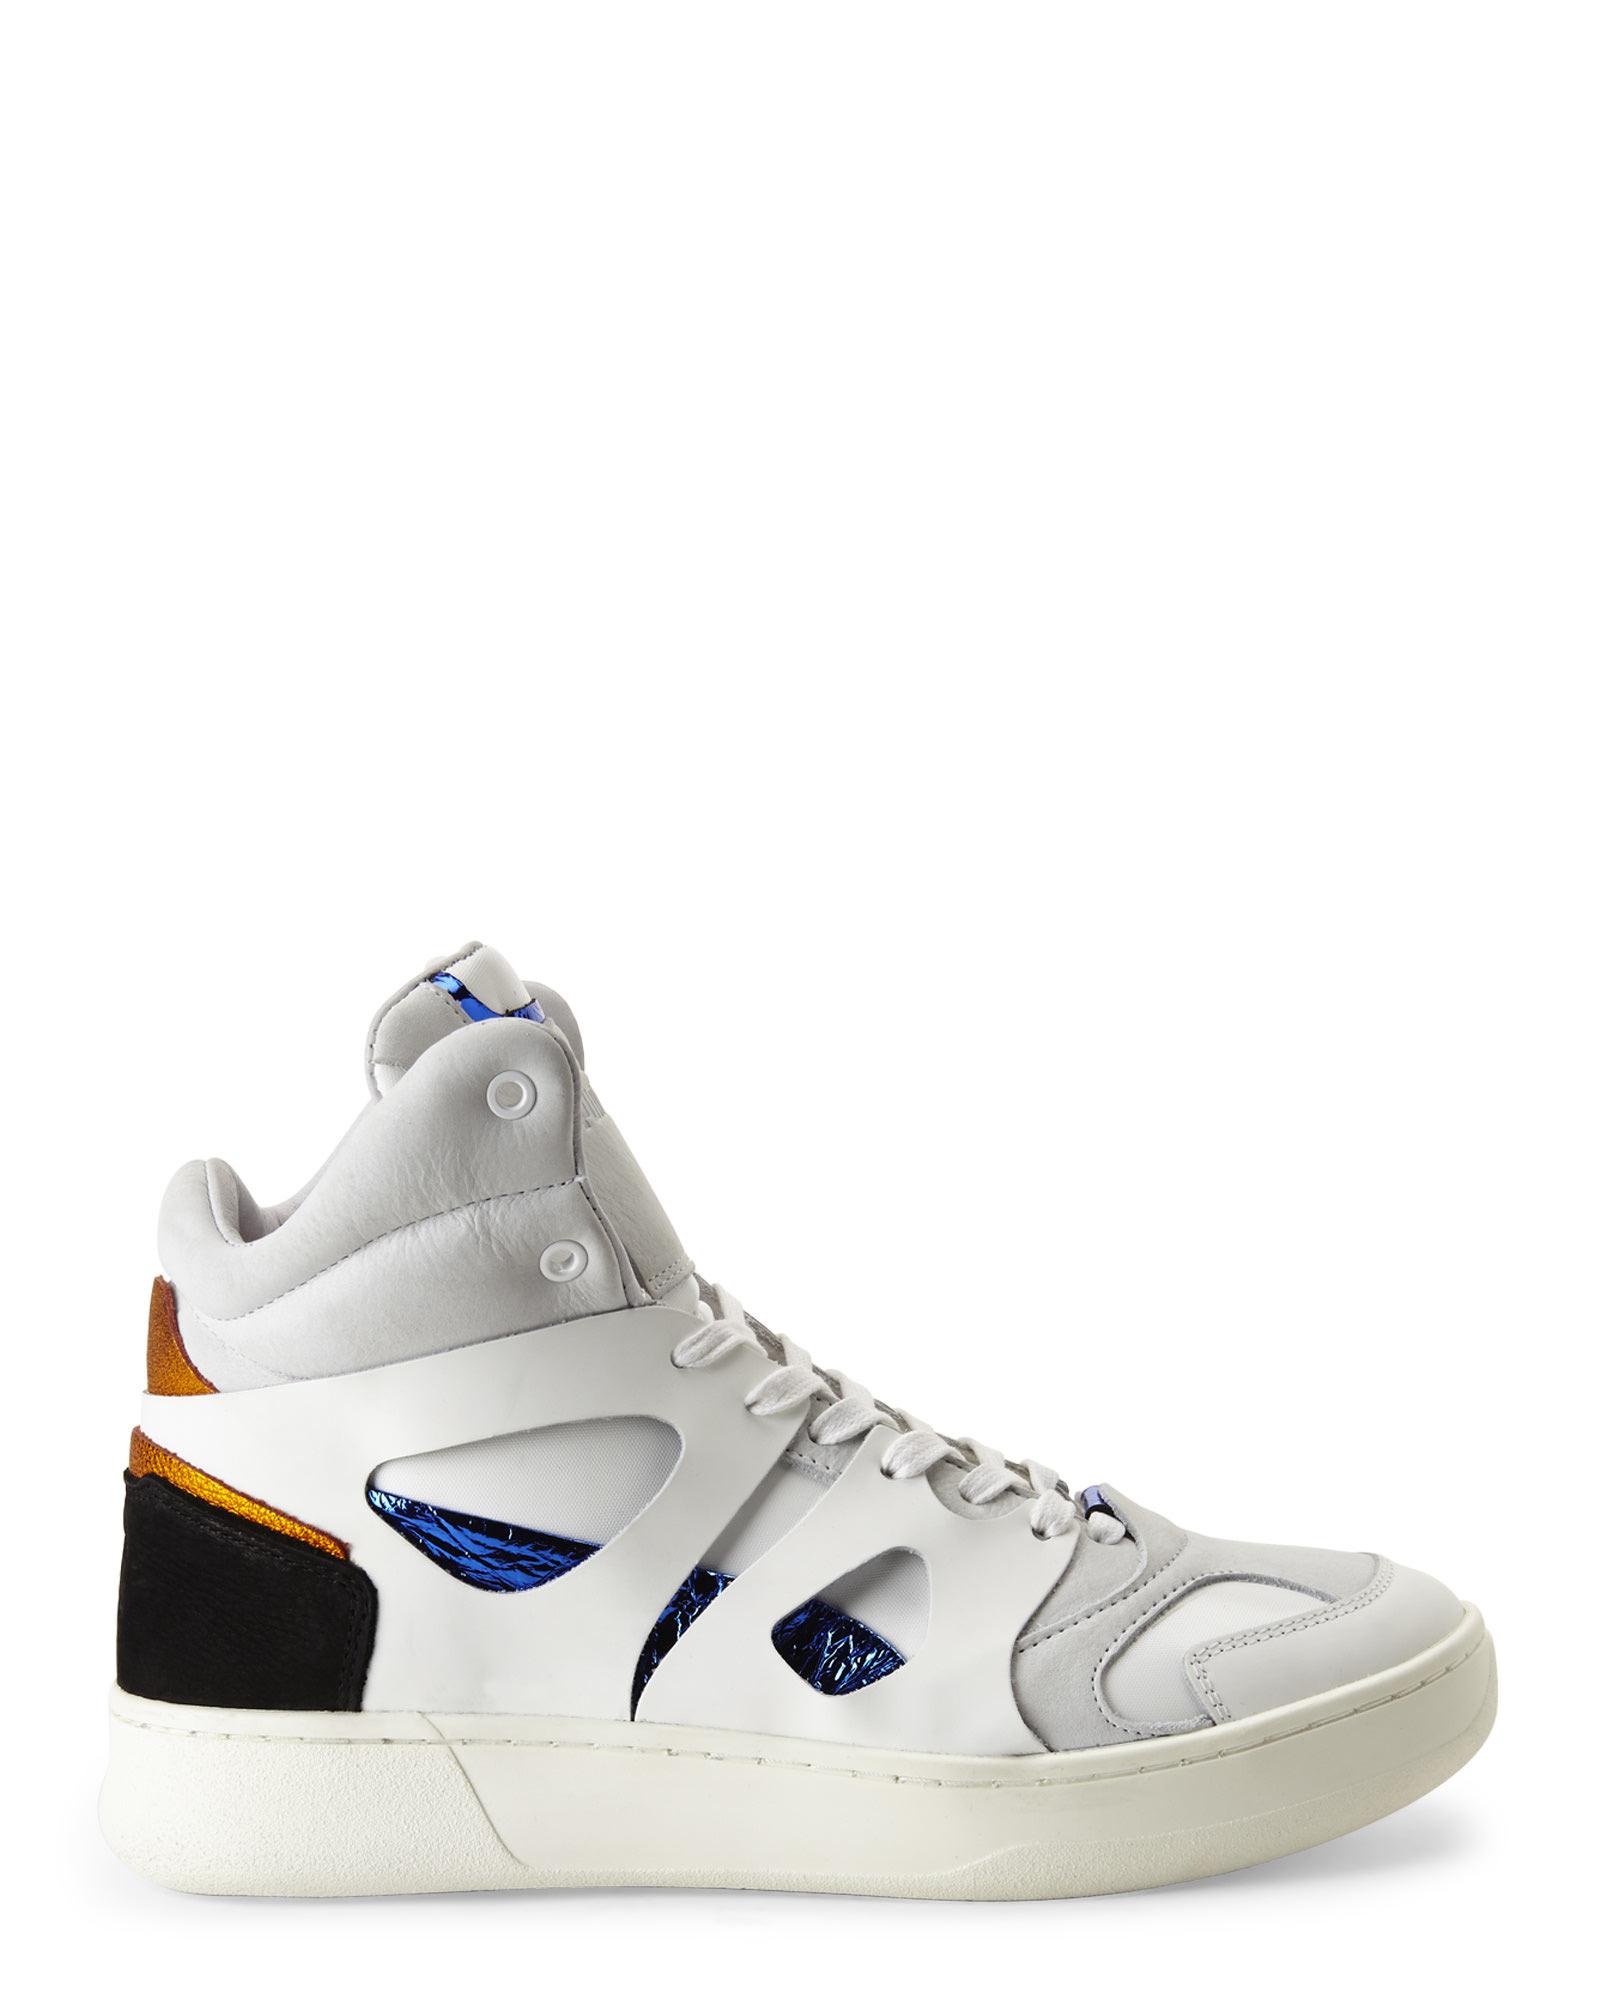 90a9d903d509 Puma X Alexander Mcqueen Sneakers consumabulbs.co.uk